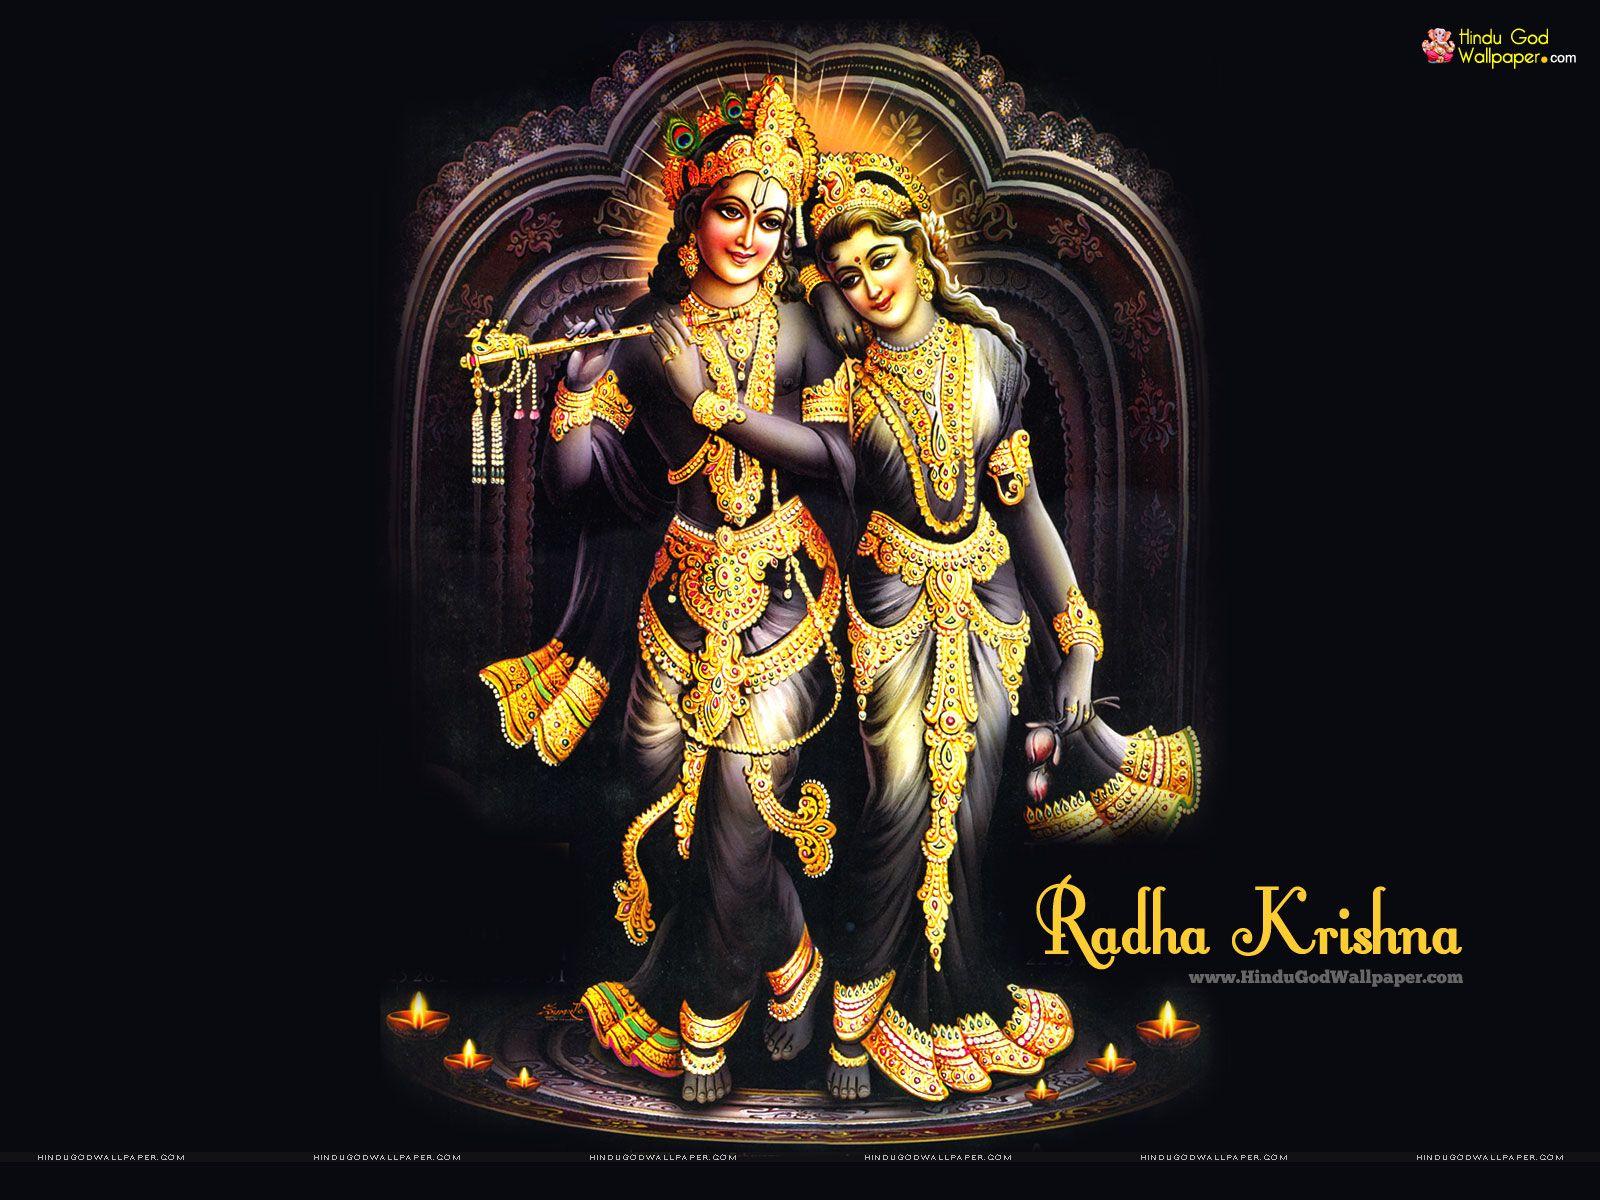 Radha krishna wallpapers full size - Radha Krishna Wallpaper Hd Full Size 1600x1200px